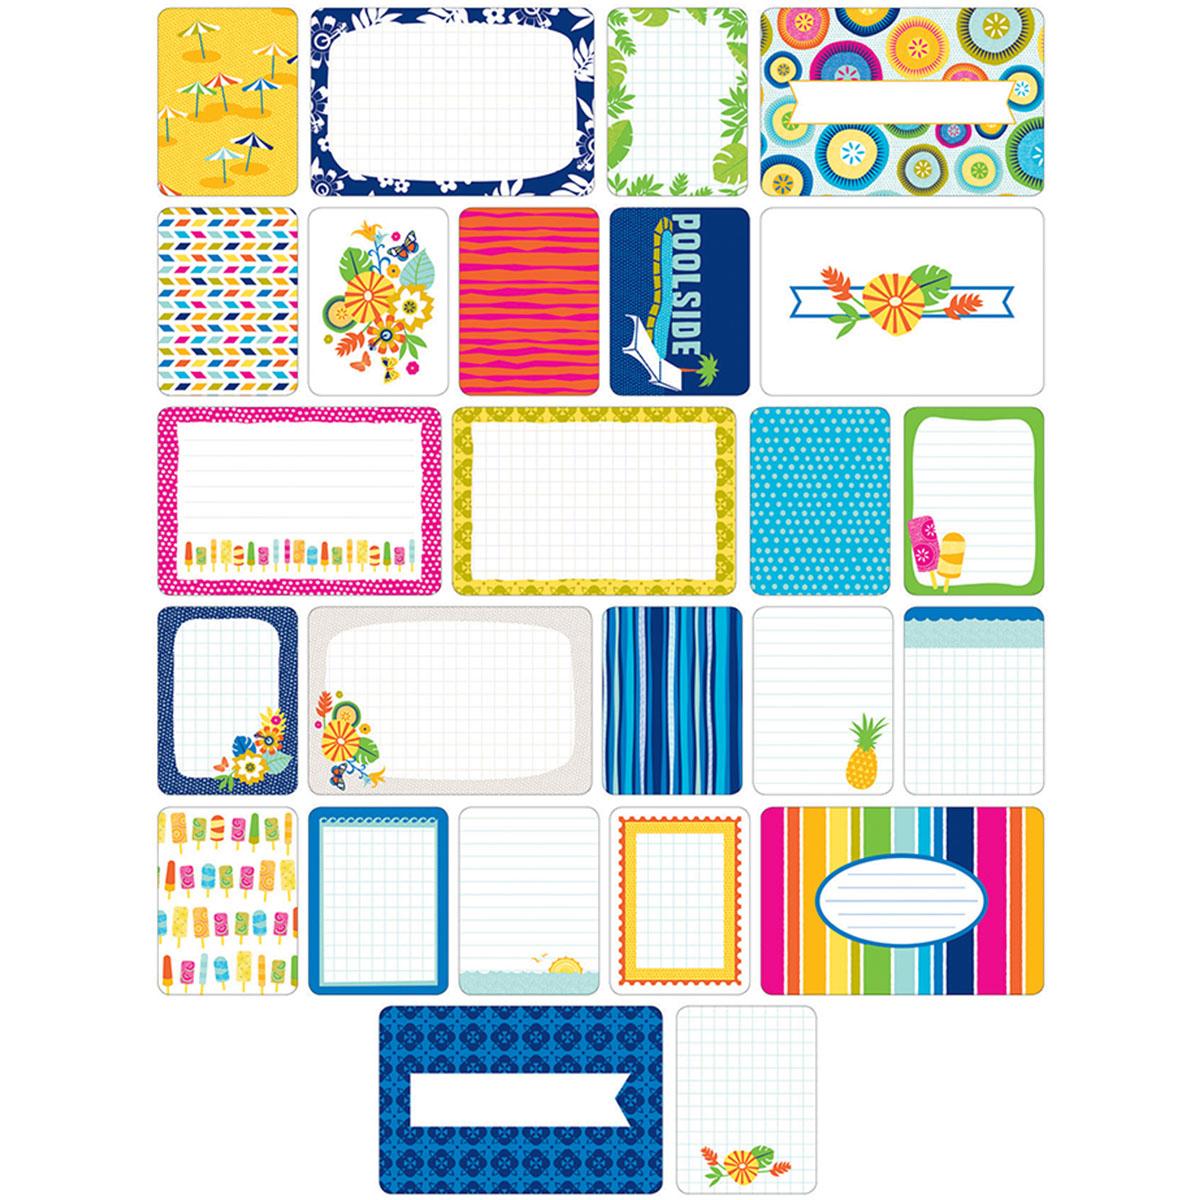 Project Life Themed Cards 60pkg Tropical Joann